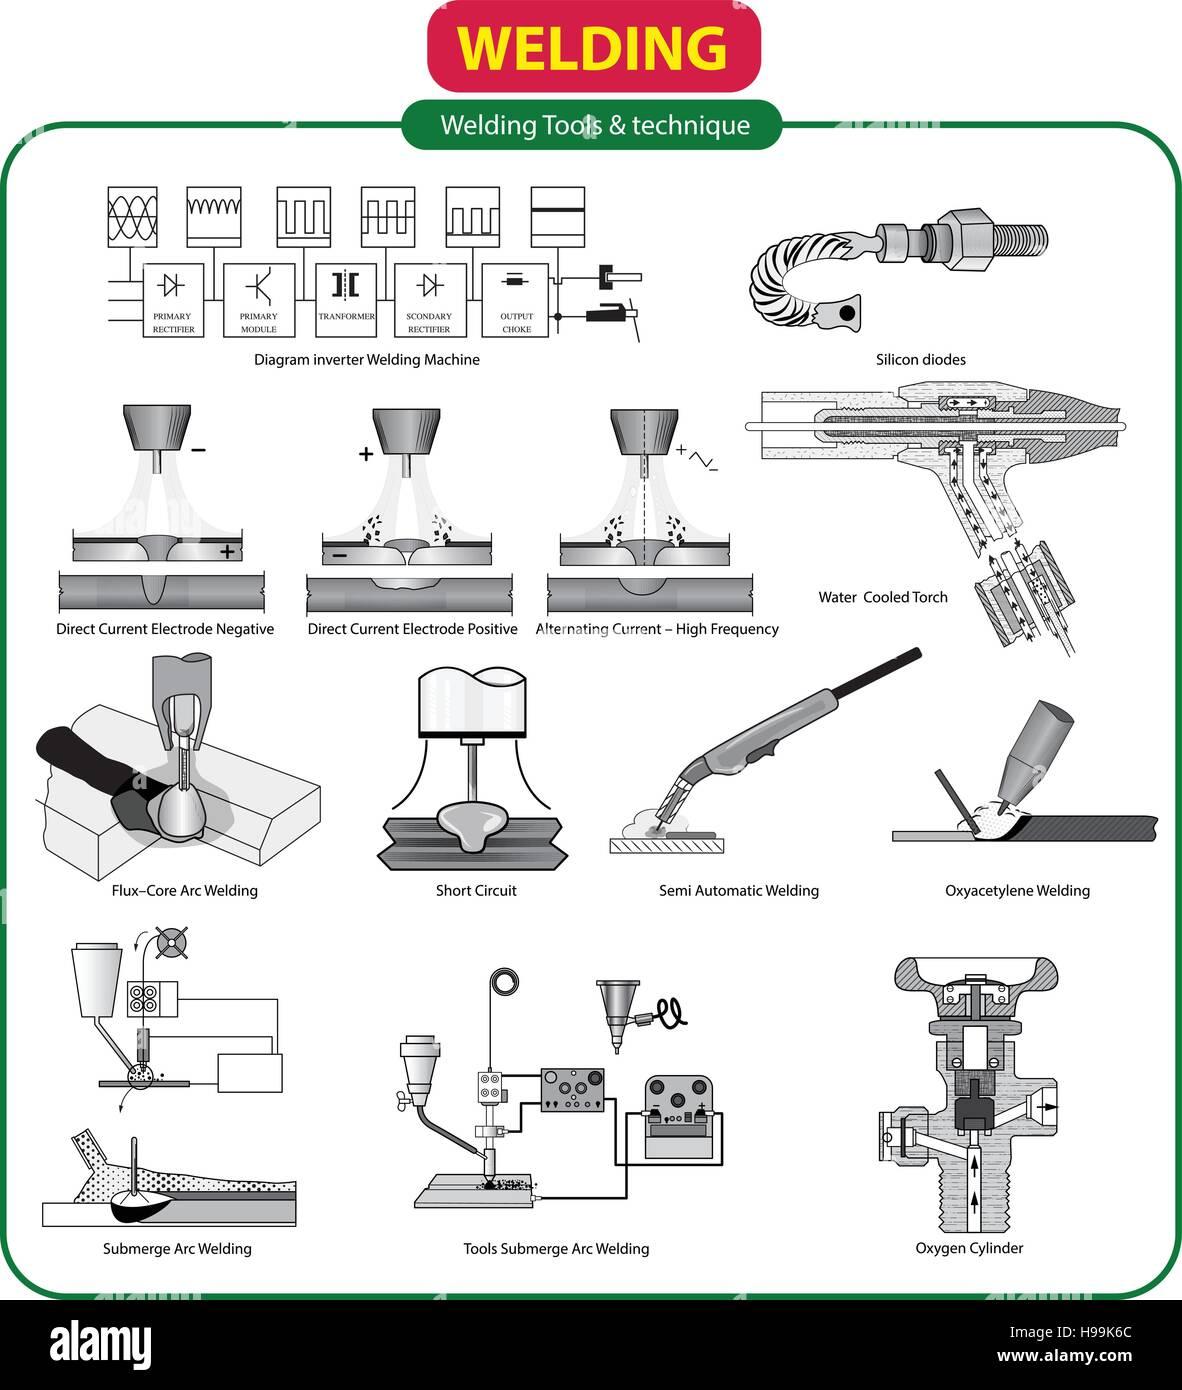 hight resolution of vector illustration of welding tools